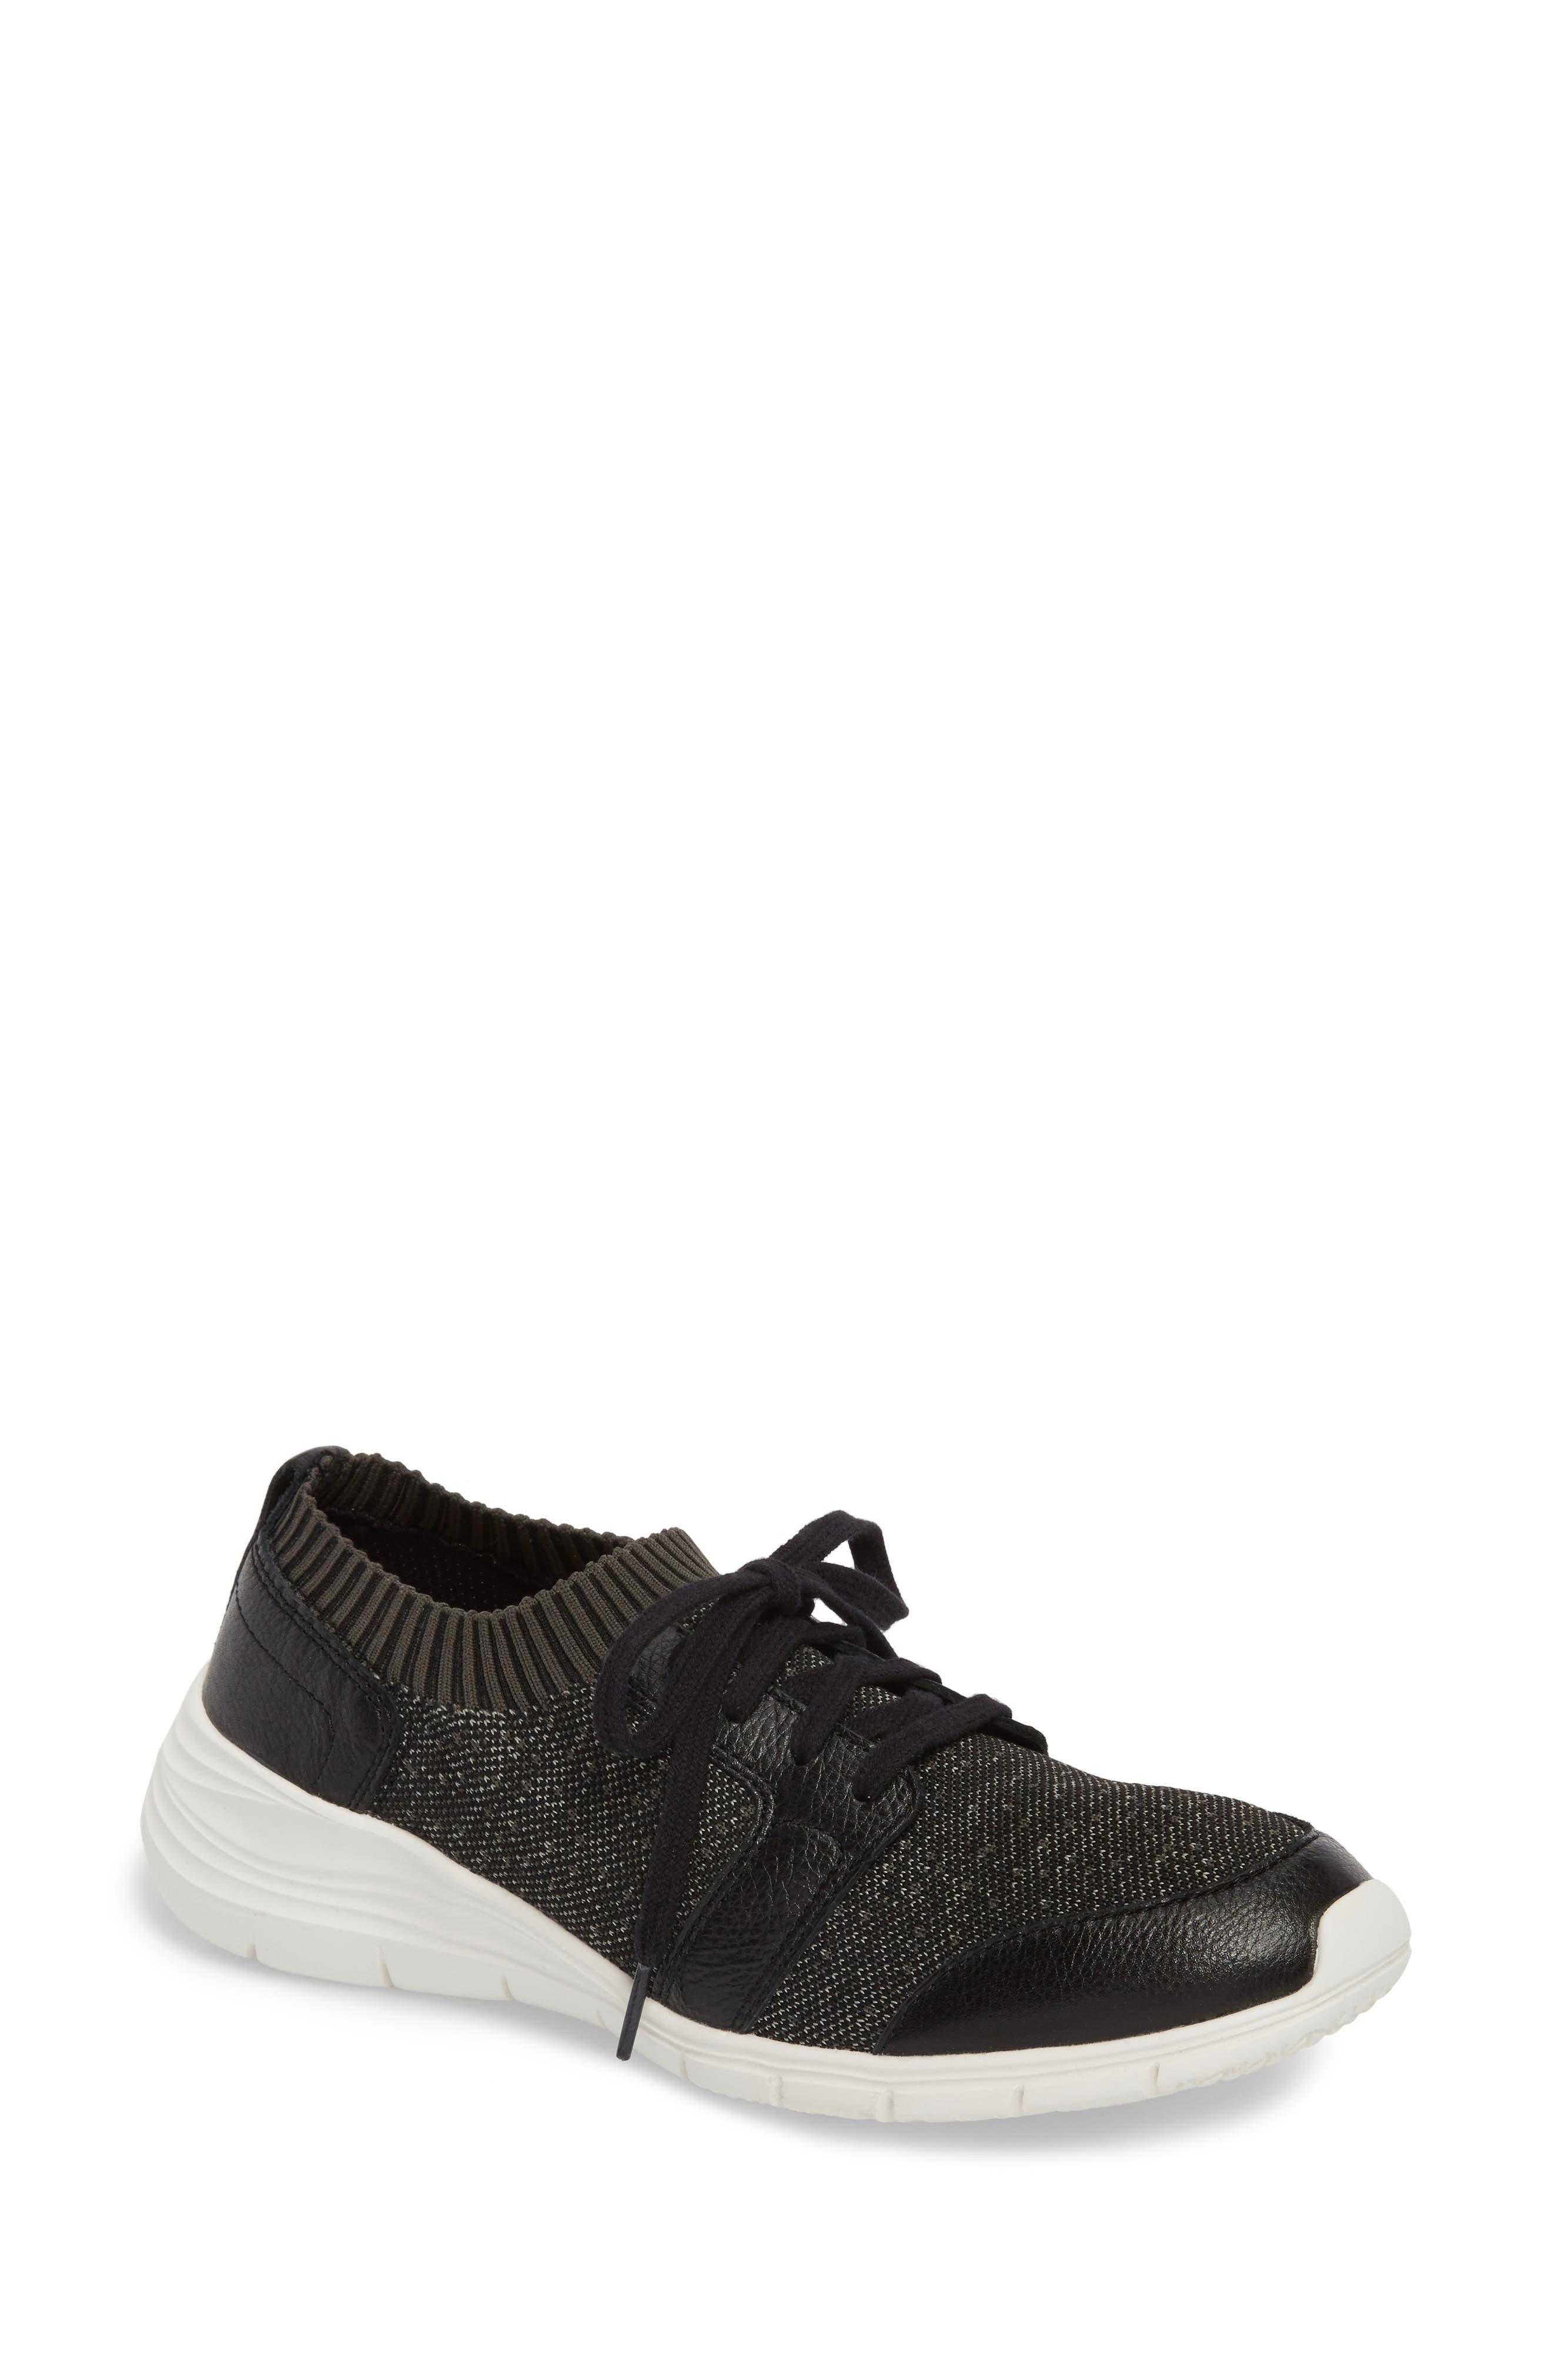 Hush Puppies Cypress Knit Sneaker- Black